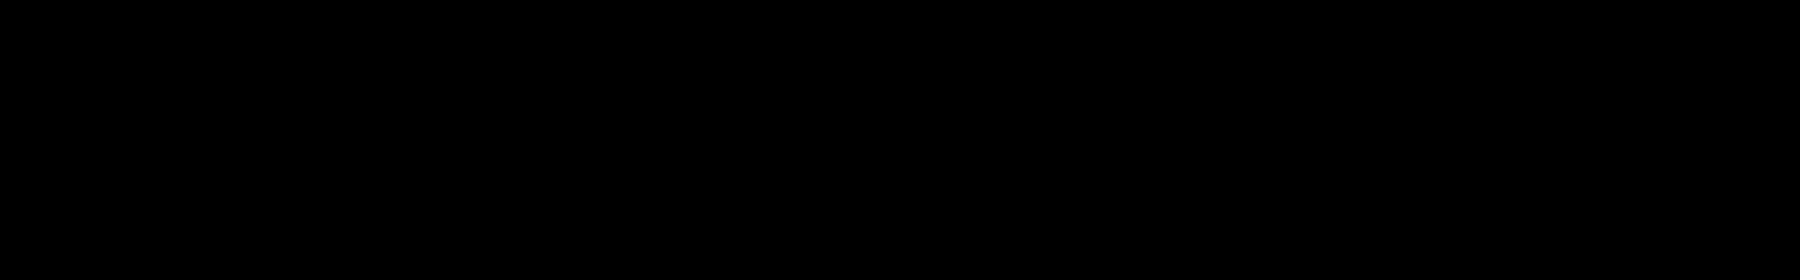 Modern Nu Disco audio waveform